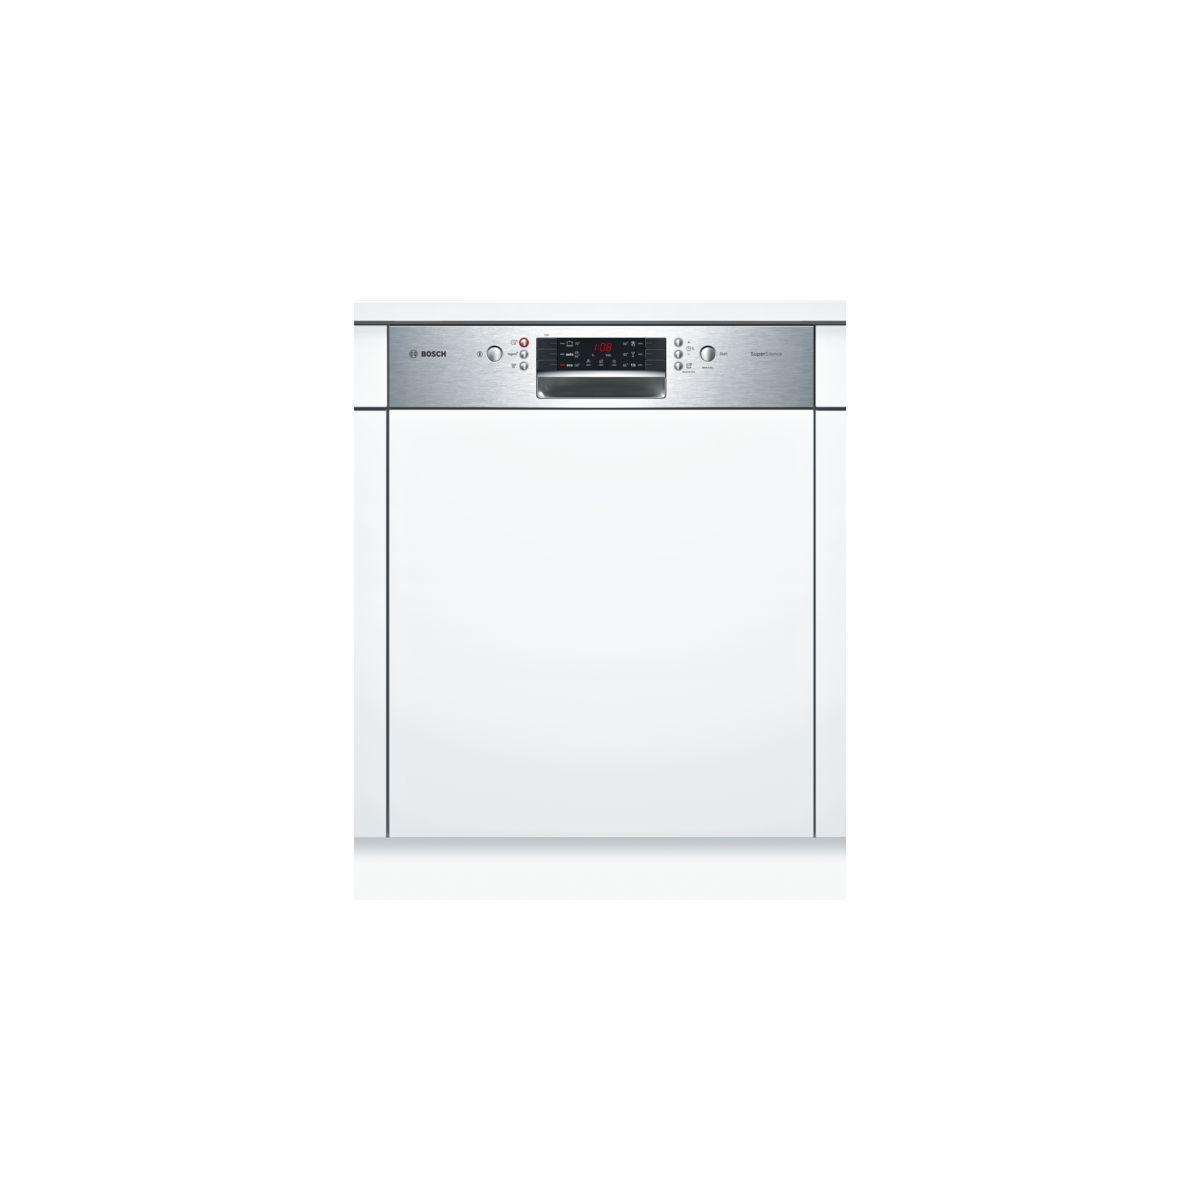 Lave vaisselle encastrable BOSCH SMI46AS04E